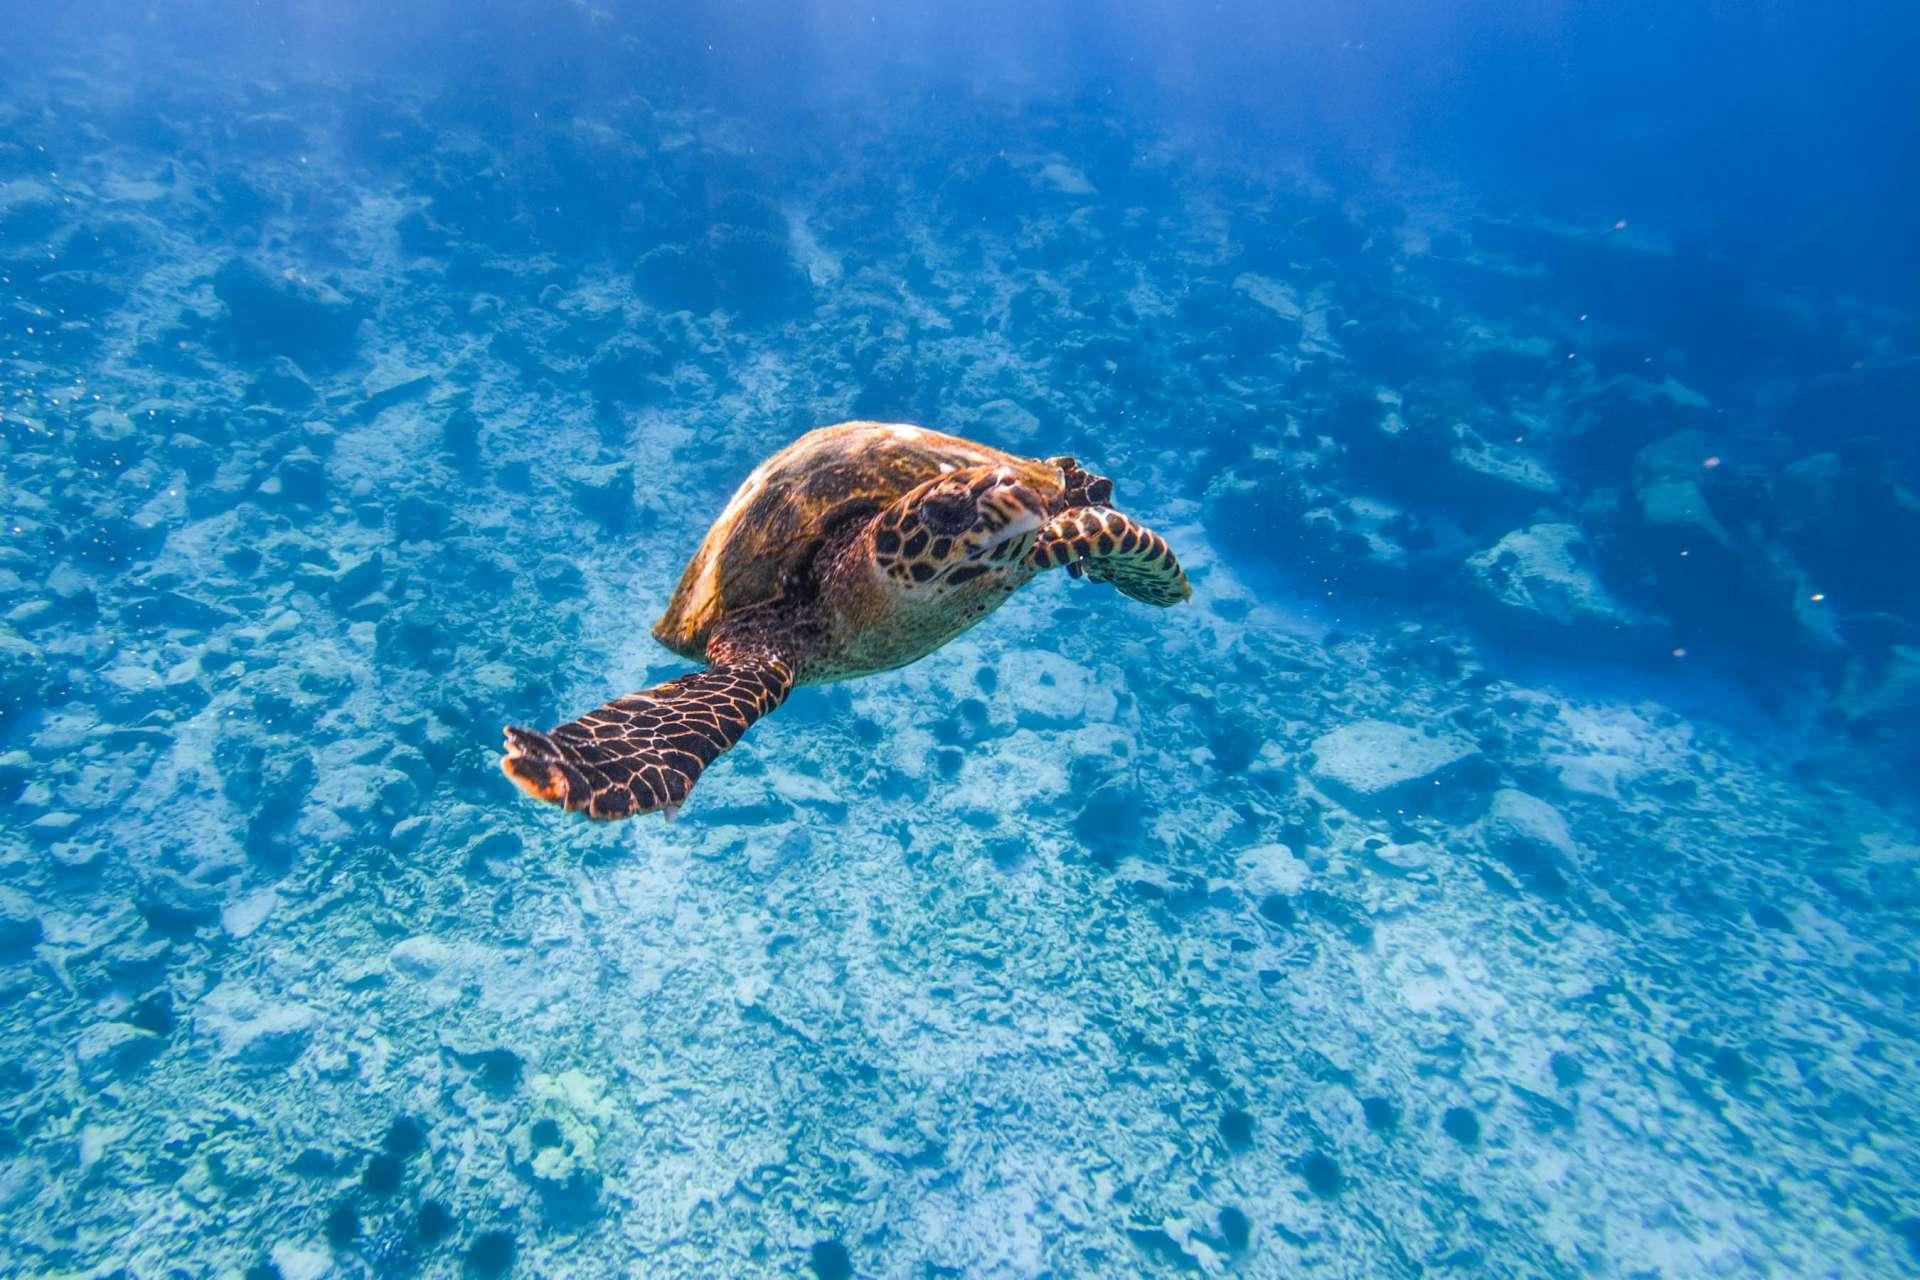 Coco island Seychelles travel photography underwater snorkeling enrico pescantini.GPR.GPR